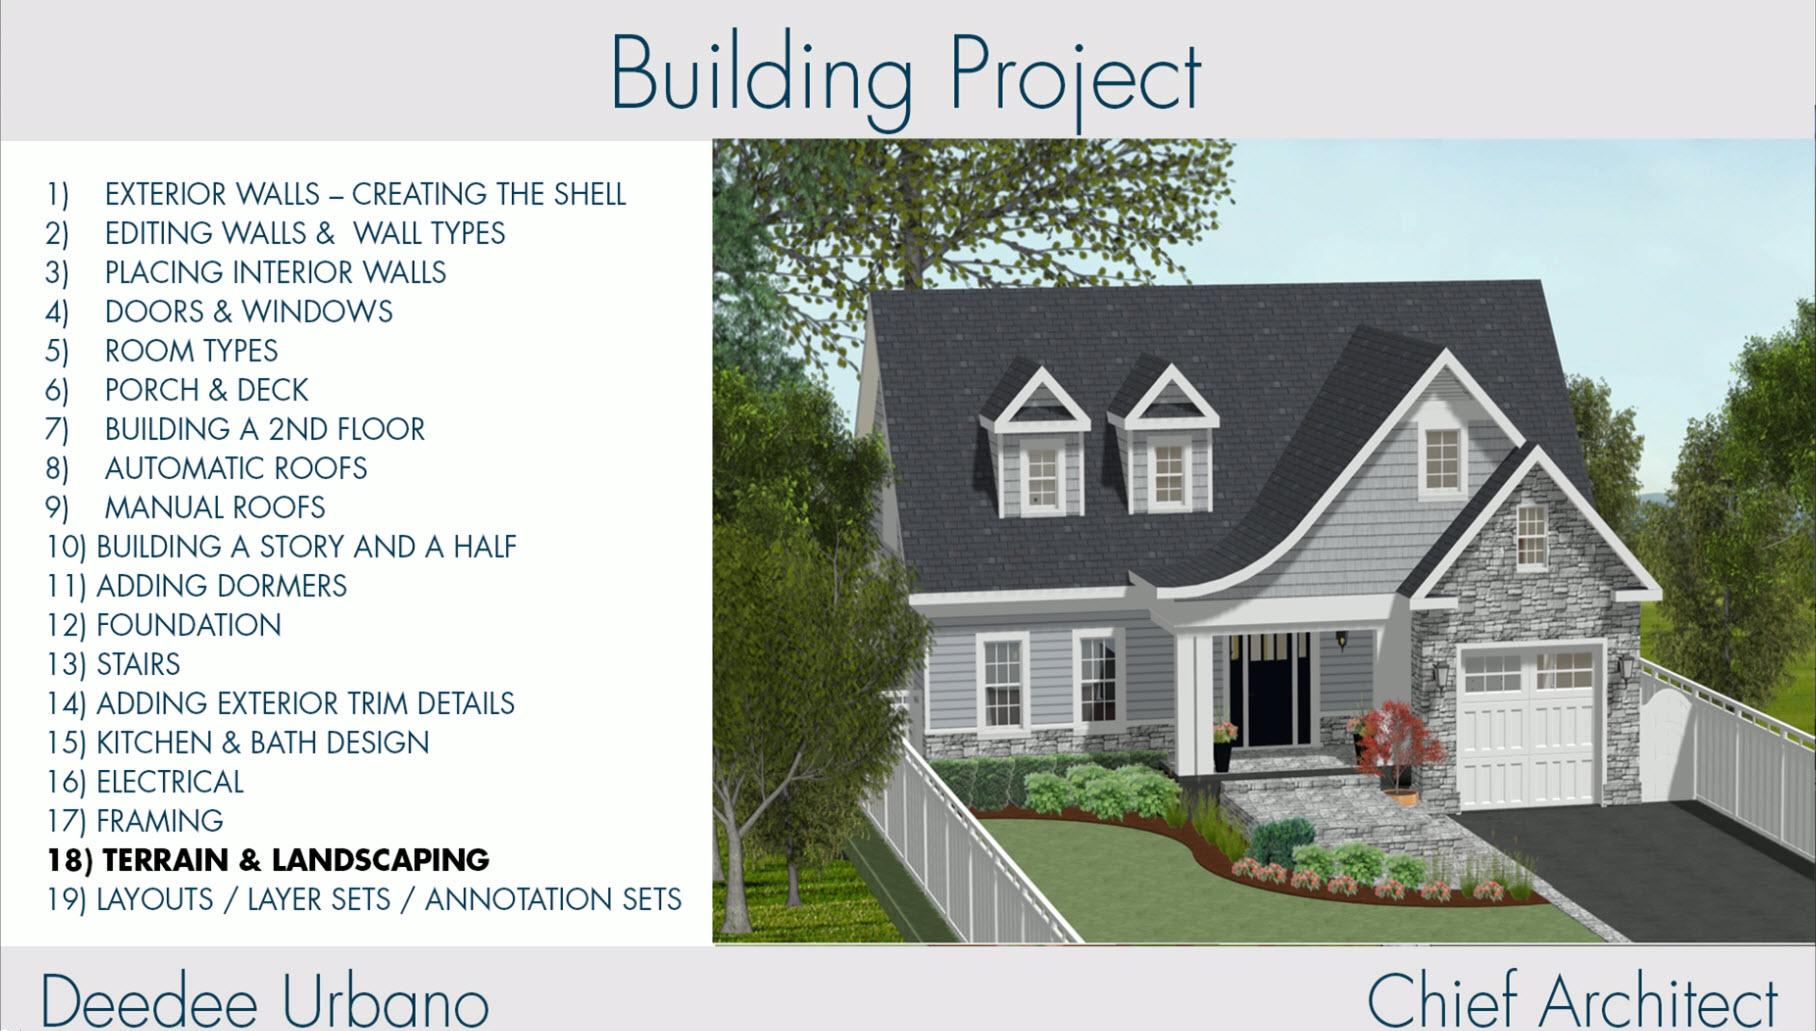 Chief architect home designer chief architect - Chief architect home designer suite free download ...